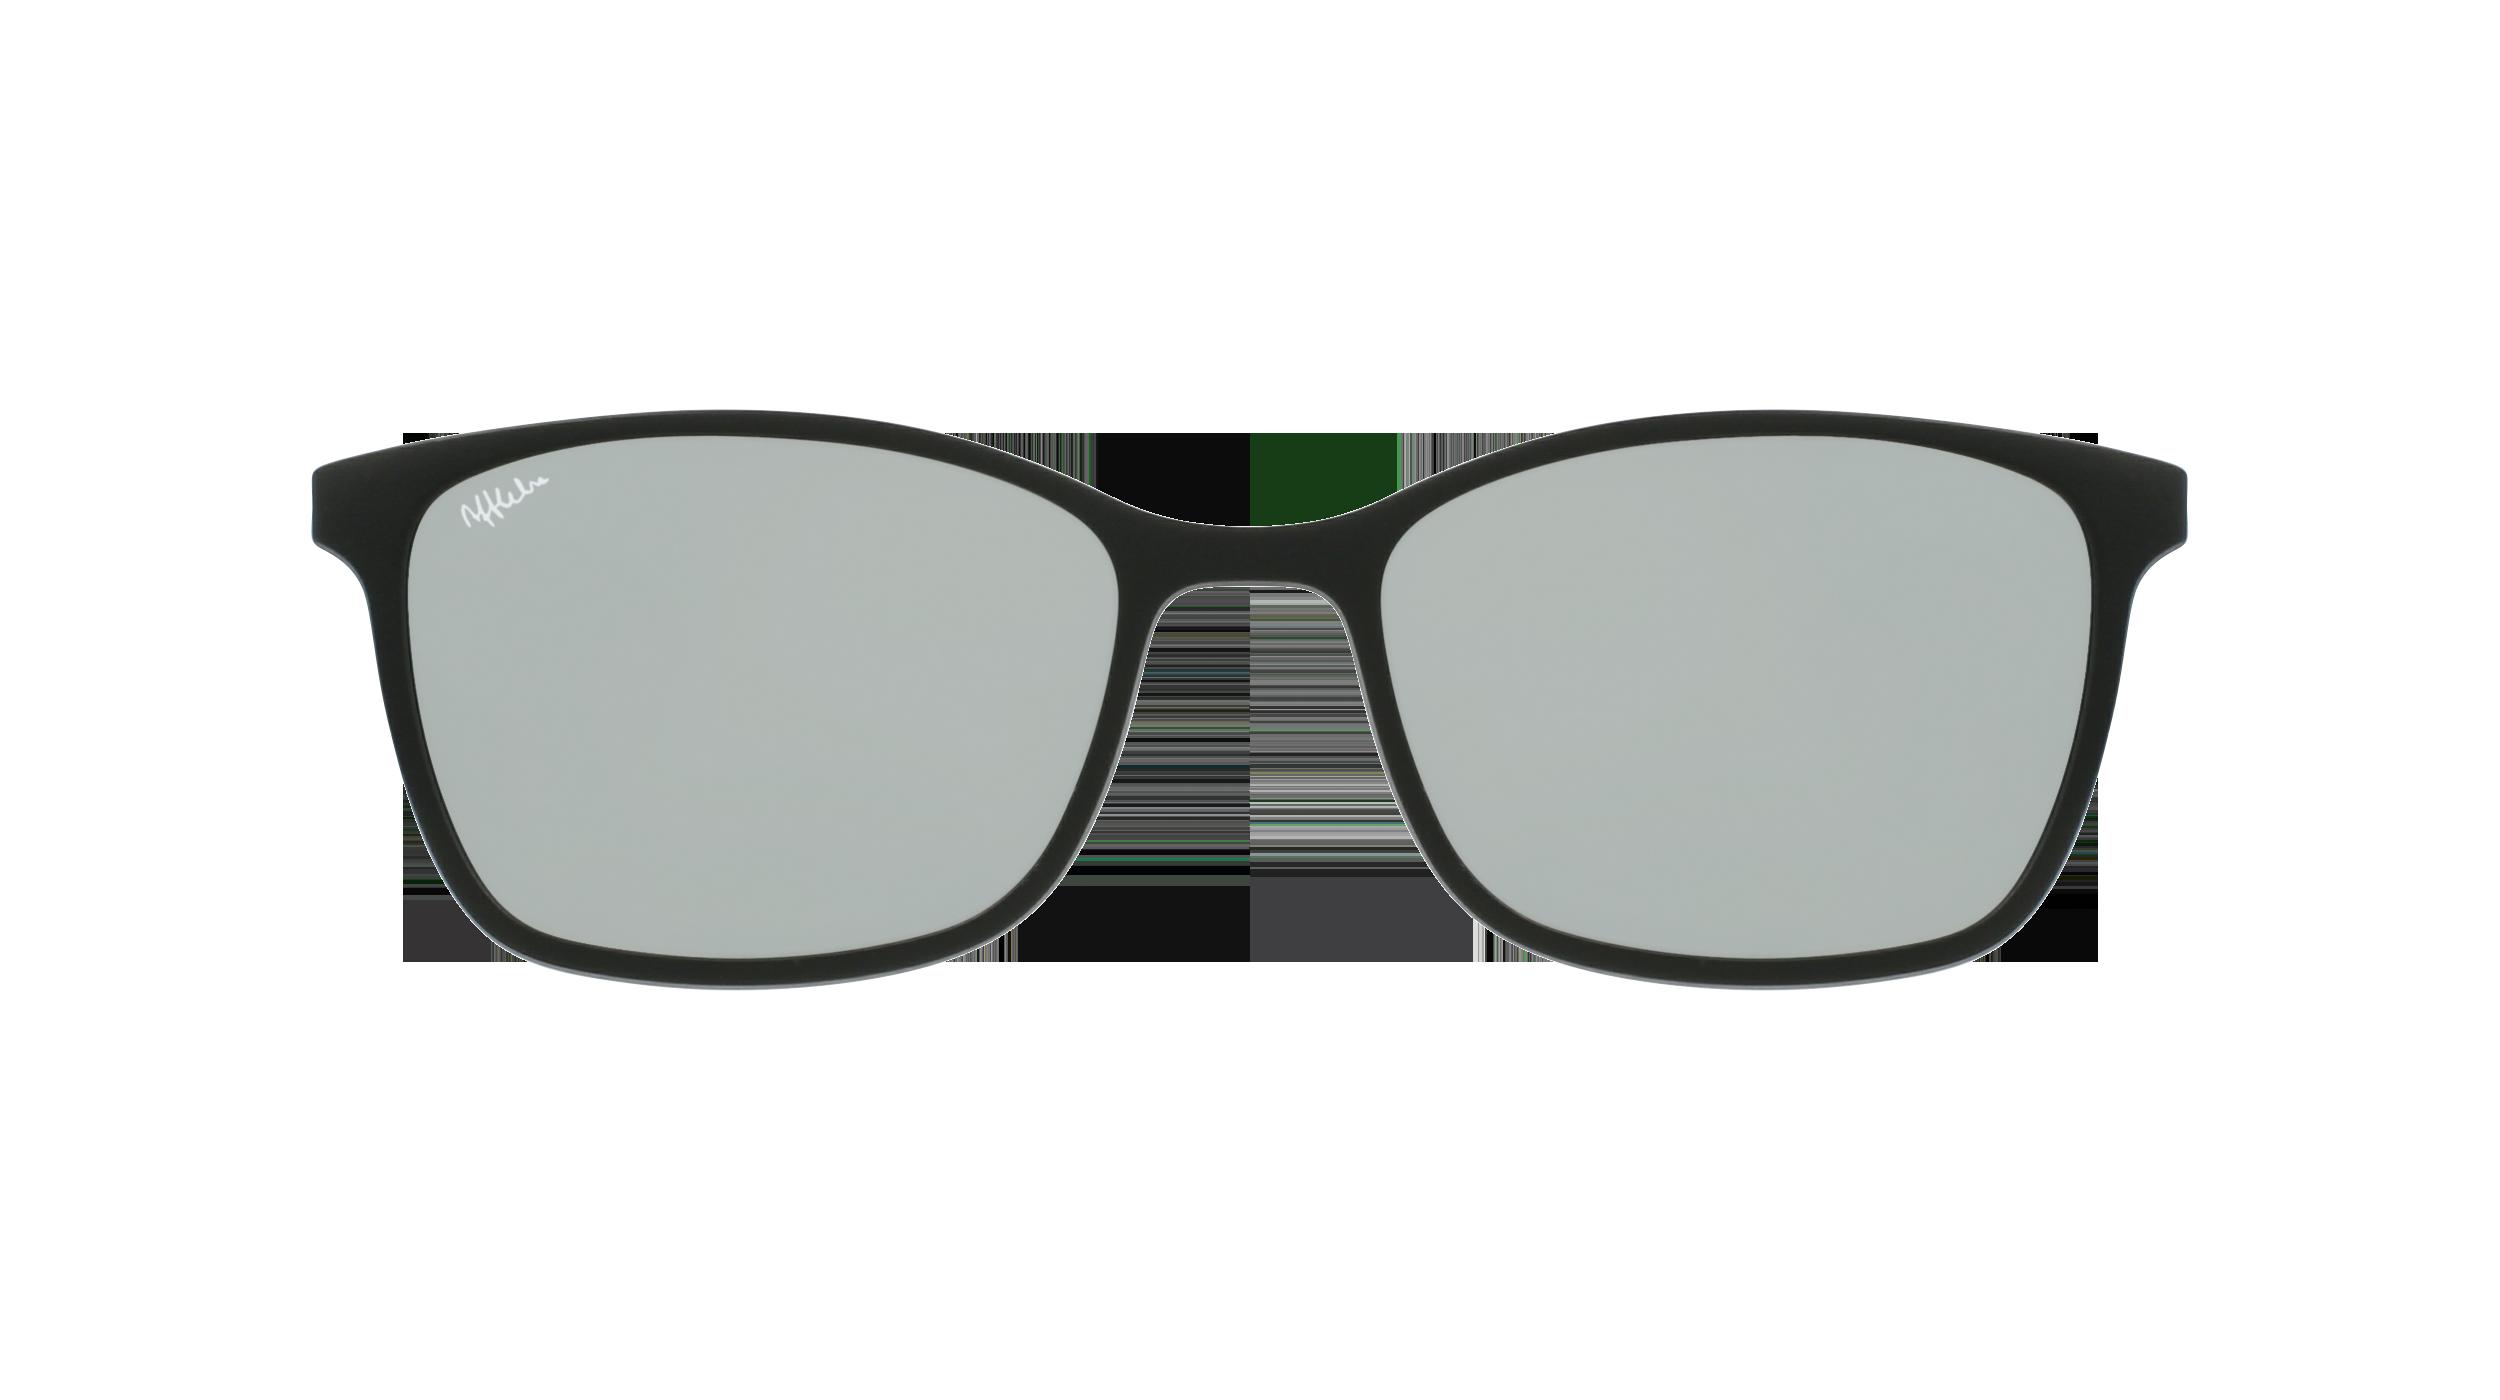 afflelou/france/products/smart_clip/clips_glasses/07630036459034.png